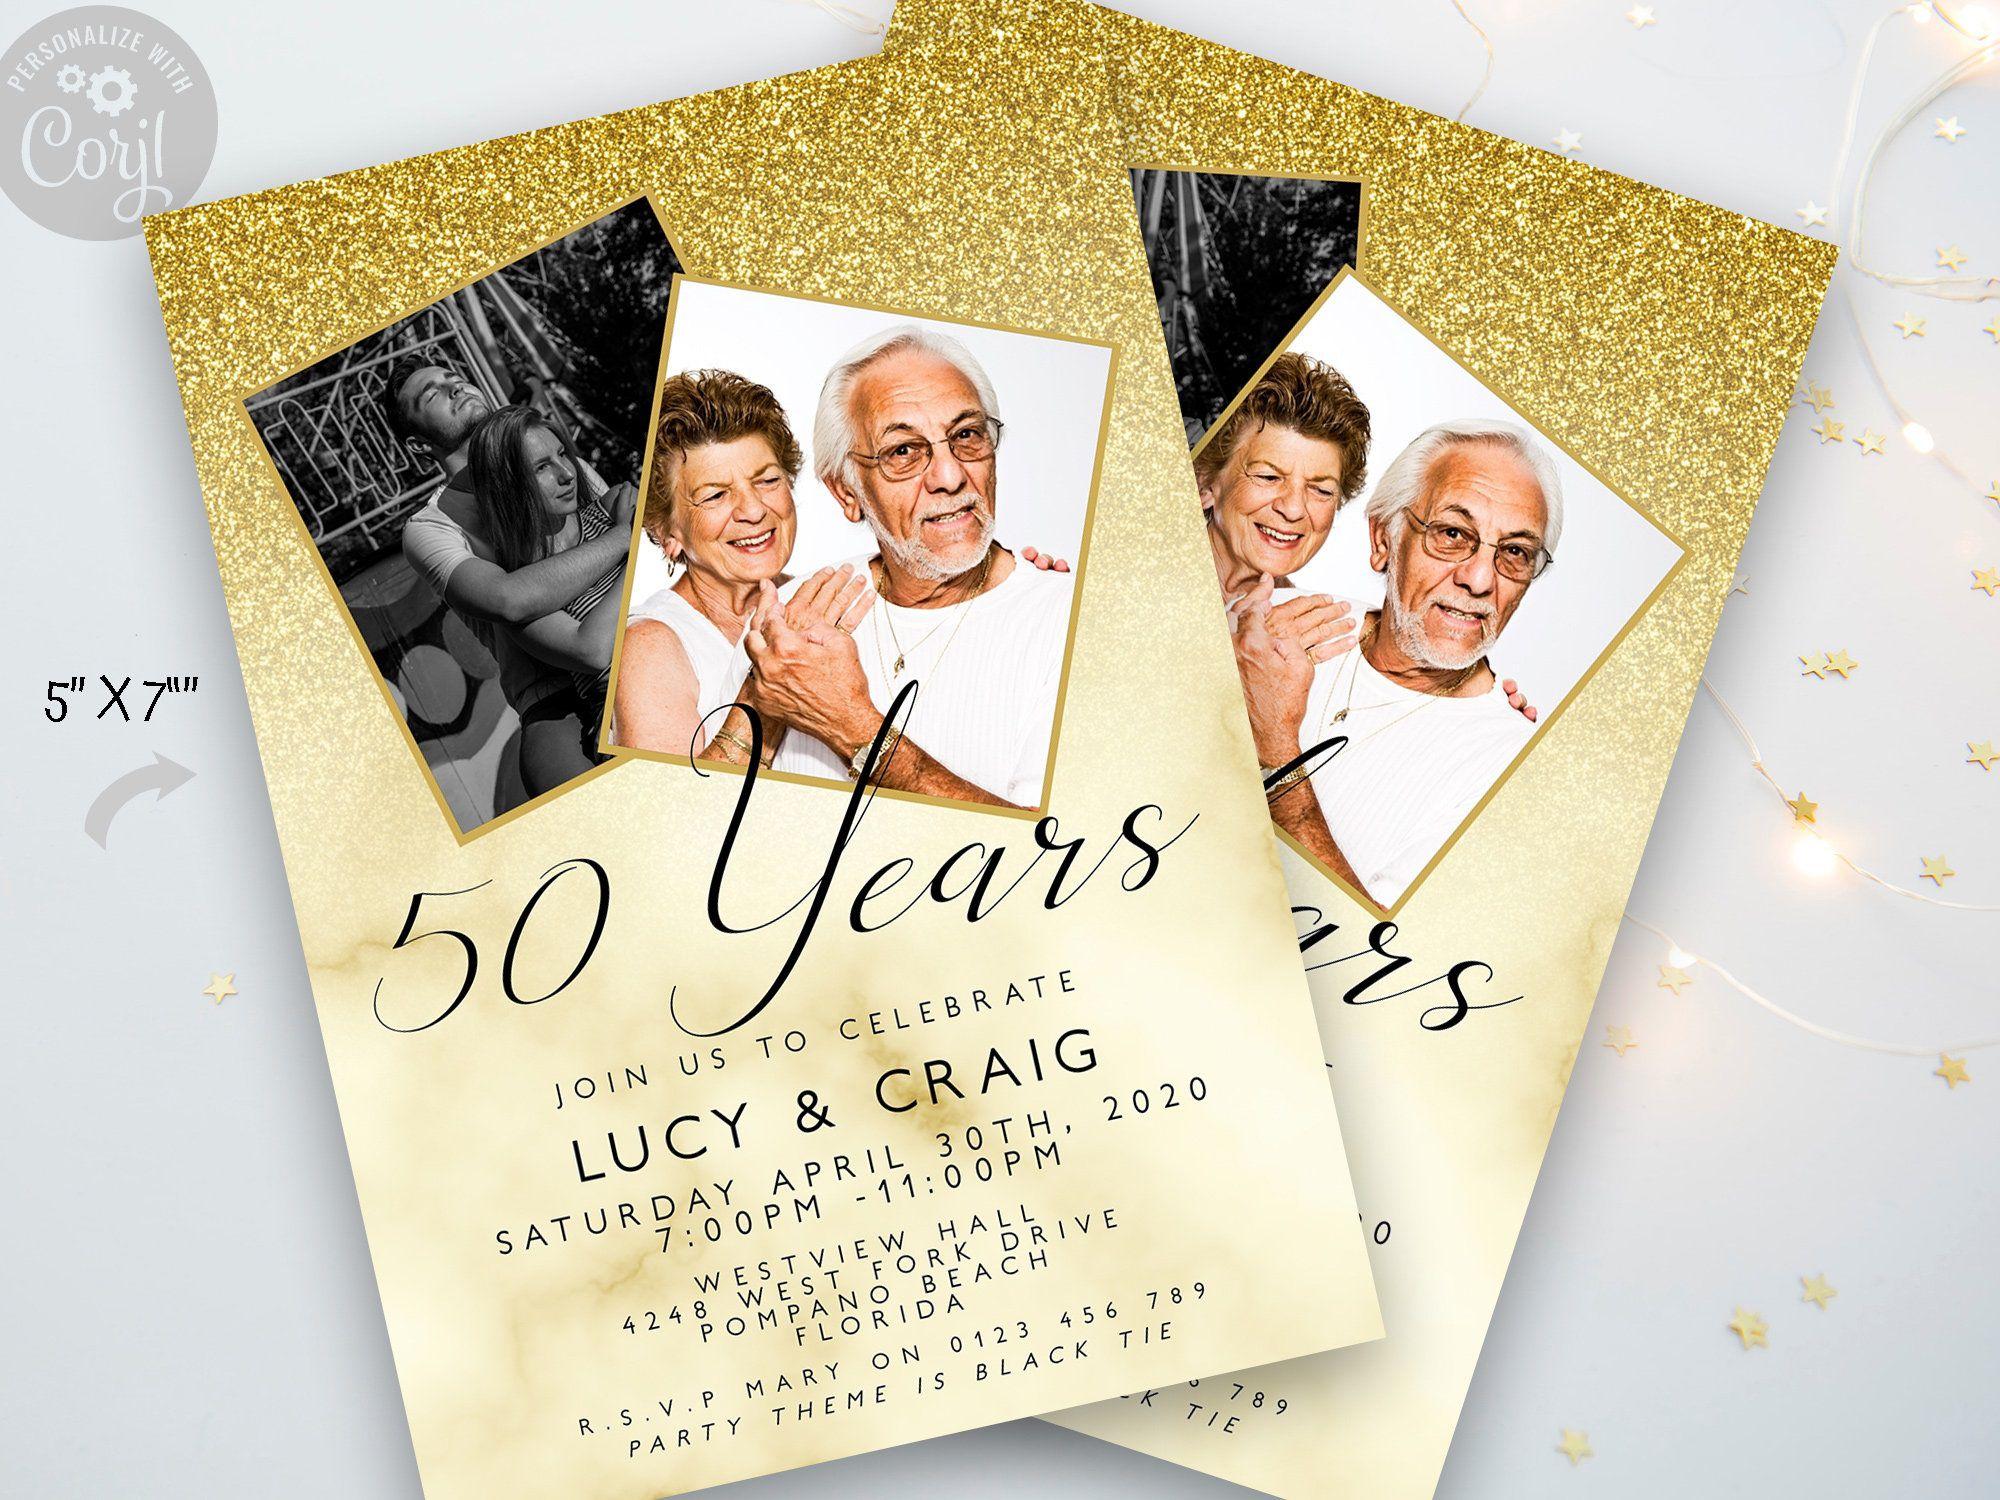 006 Rare 50th Anniversary Party Invitation Template Sample  Templates Golden Wedding Uk Microsoft Word FreeFull